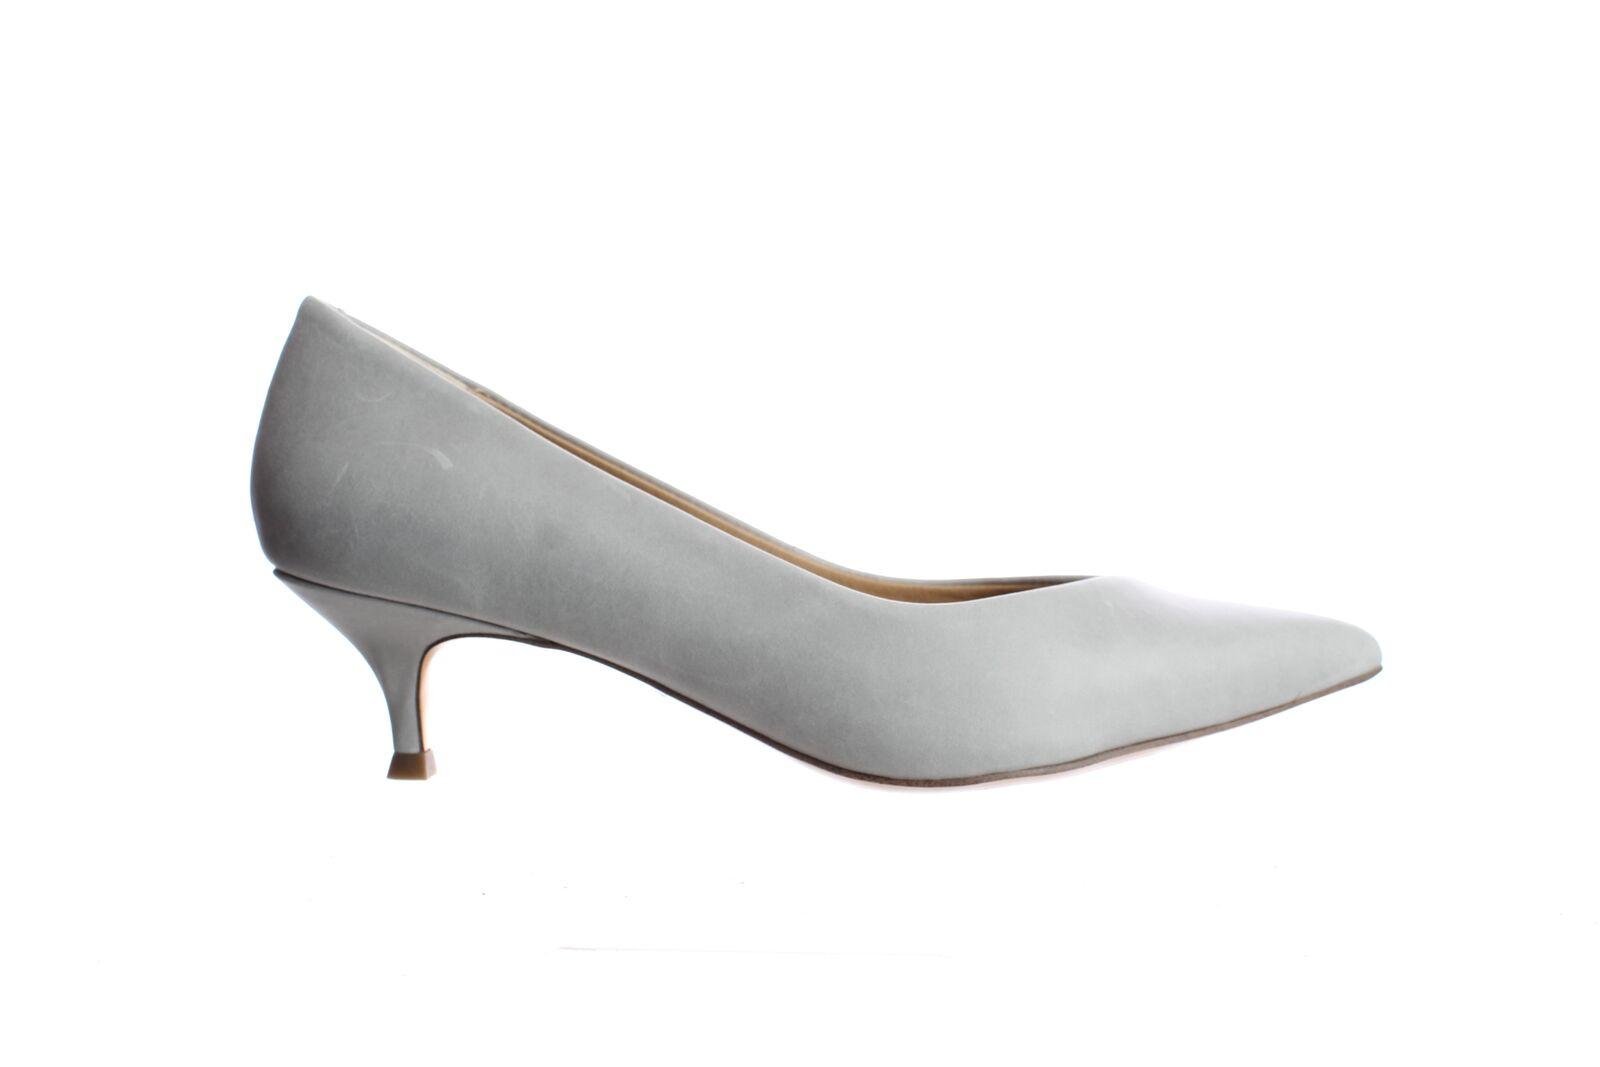 Vionic Womens Kit Josie Light Grey Leather Pumps Size 8.5 (2161965)